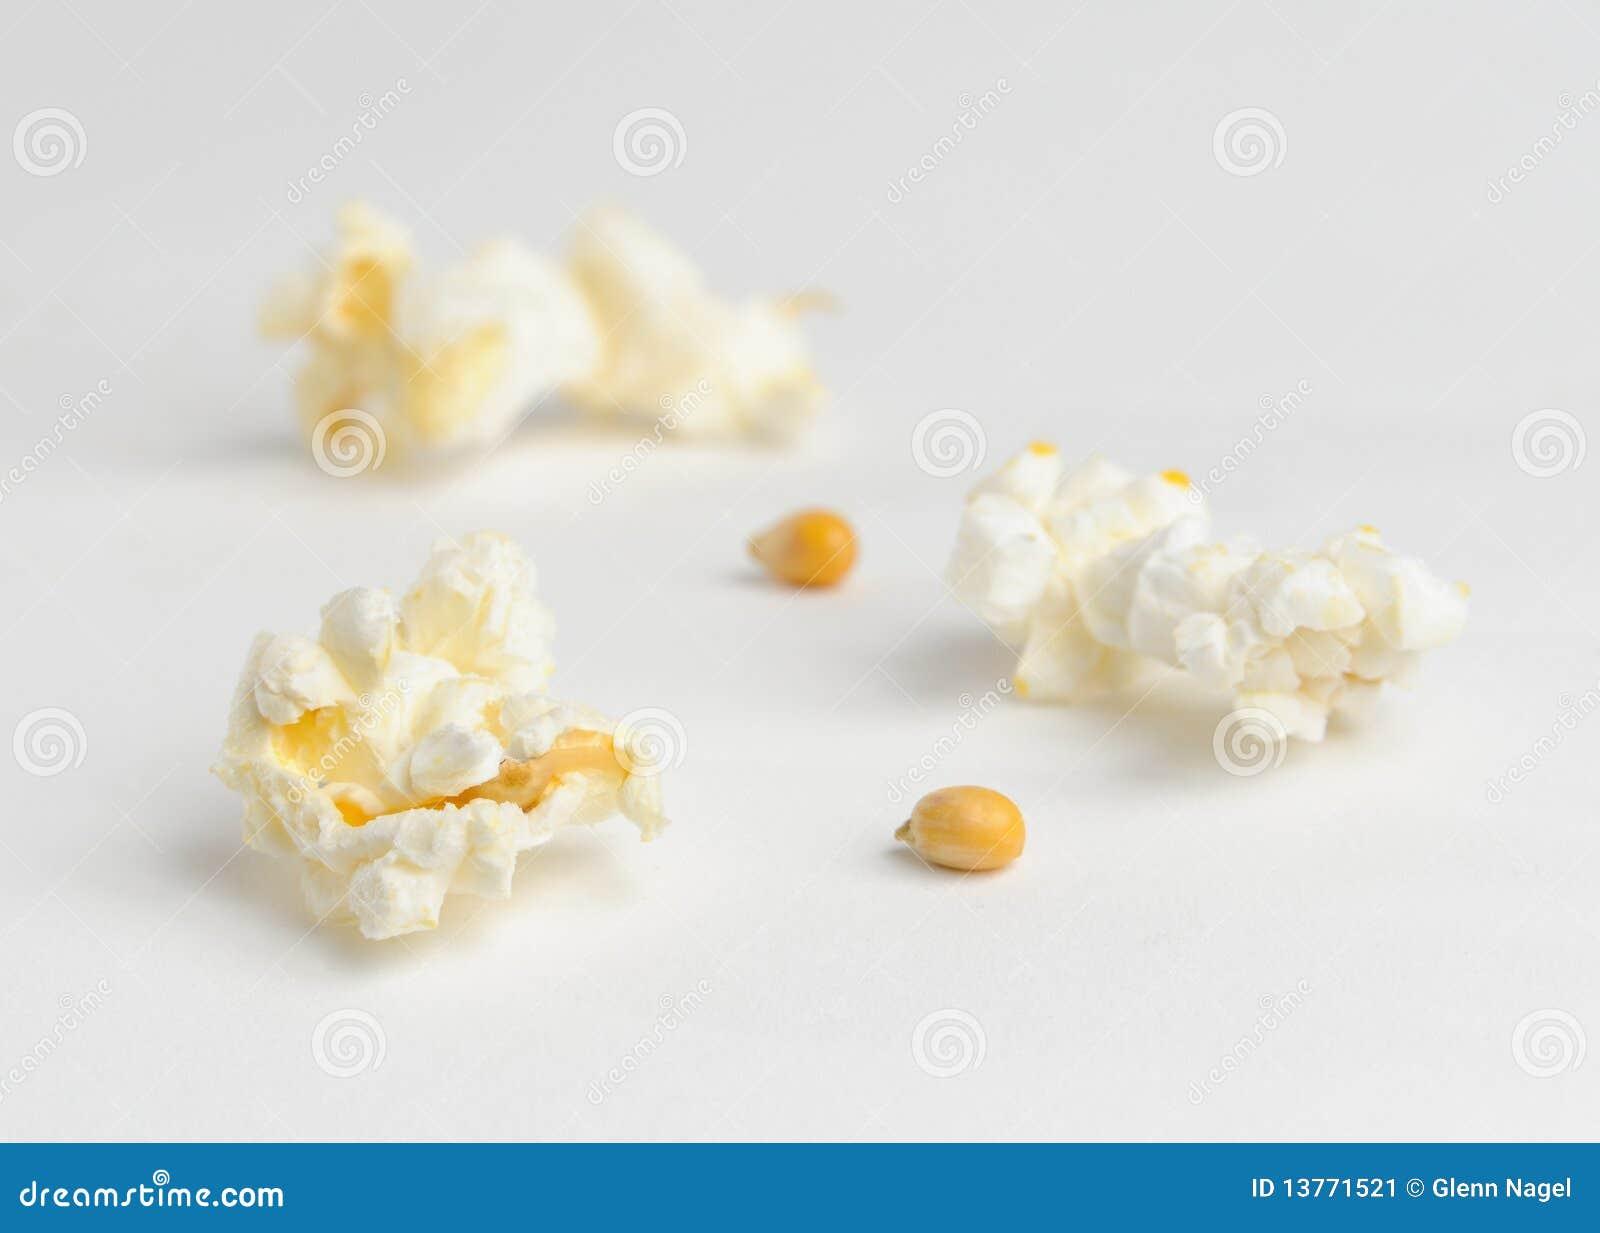 Unpopped Popcorn Kernel Clipart Popcorn Kernels...